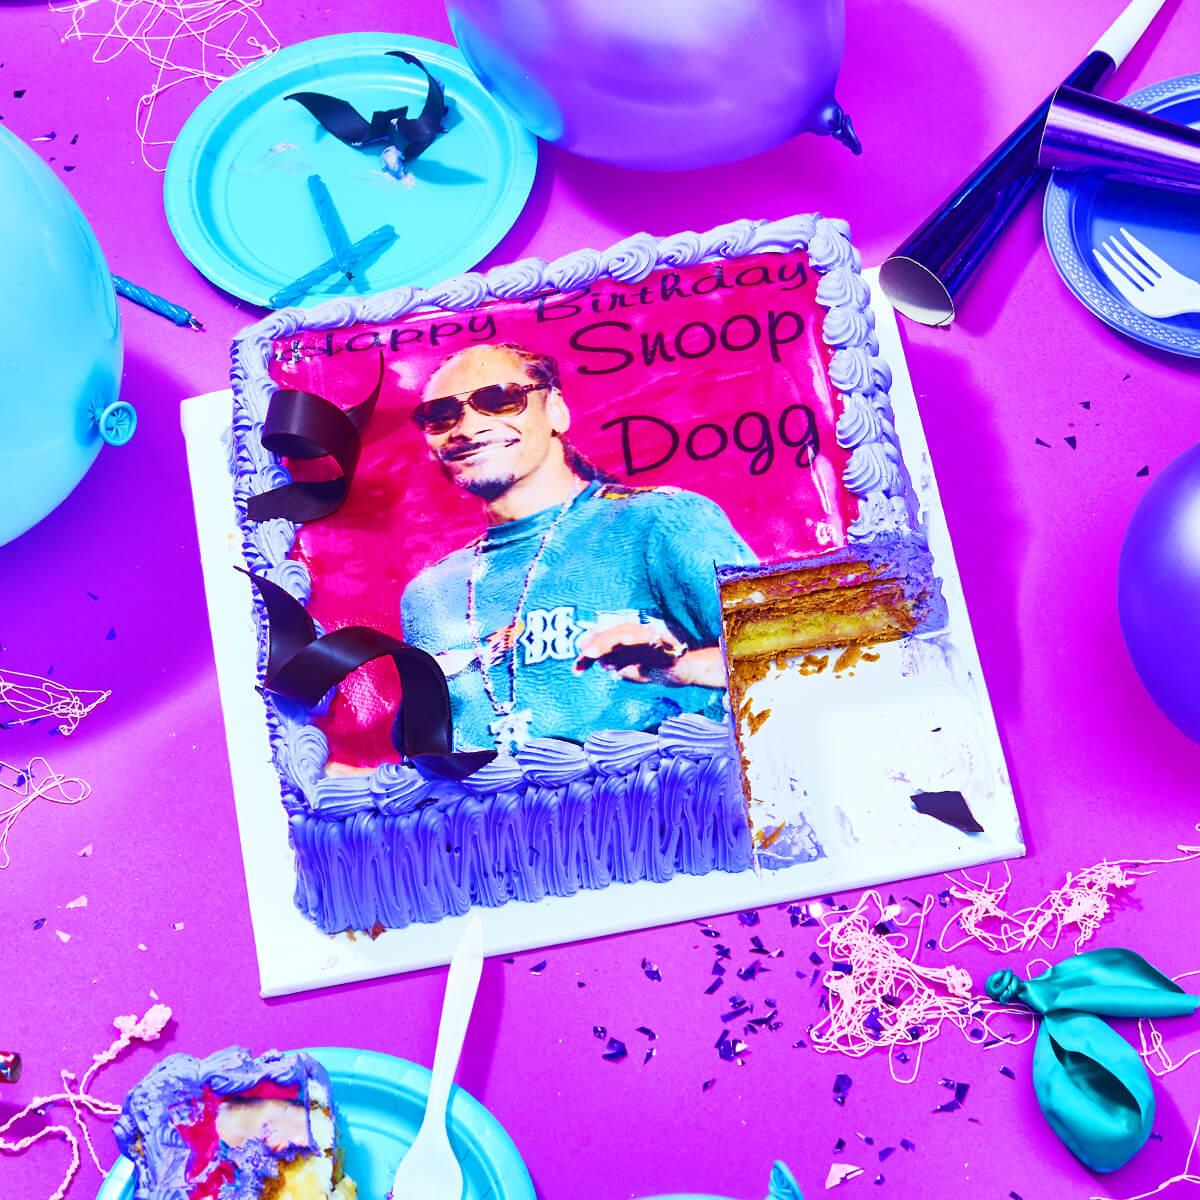 Birthday cake for Snoop Dogg!